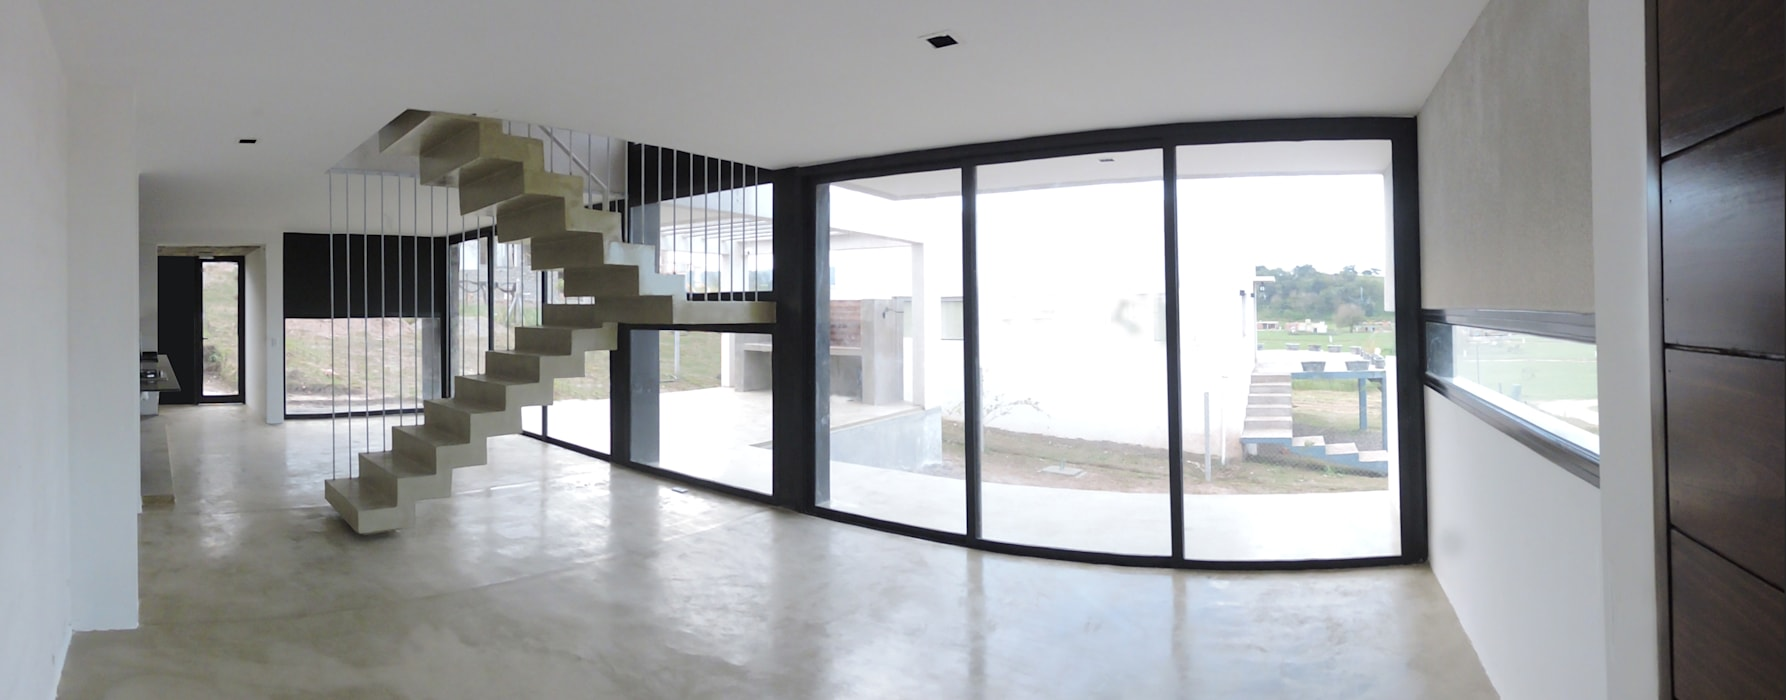 Casa LL: Paredes de estilo  por jose m zamora ARQ,Minimalista